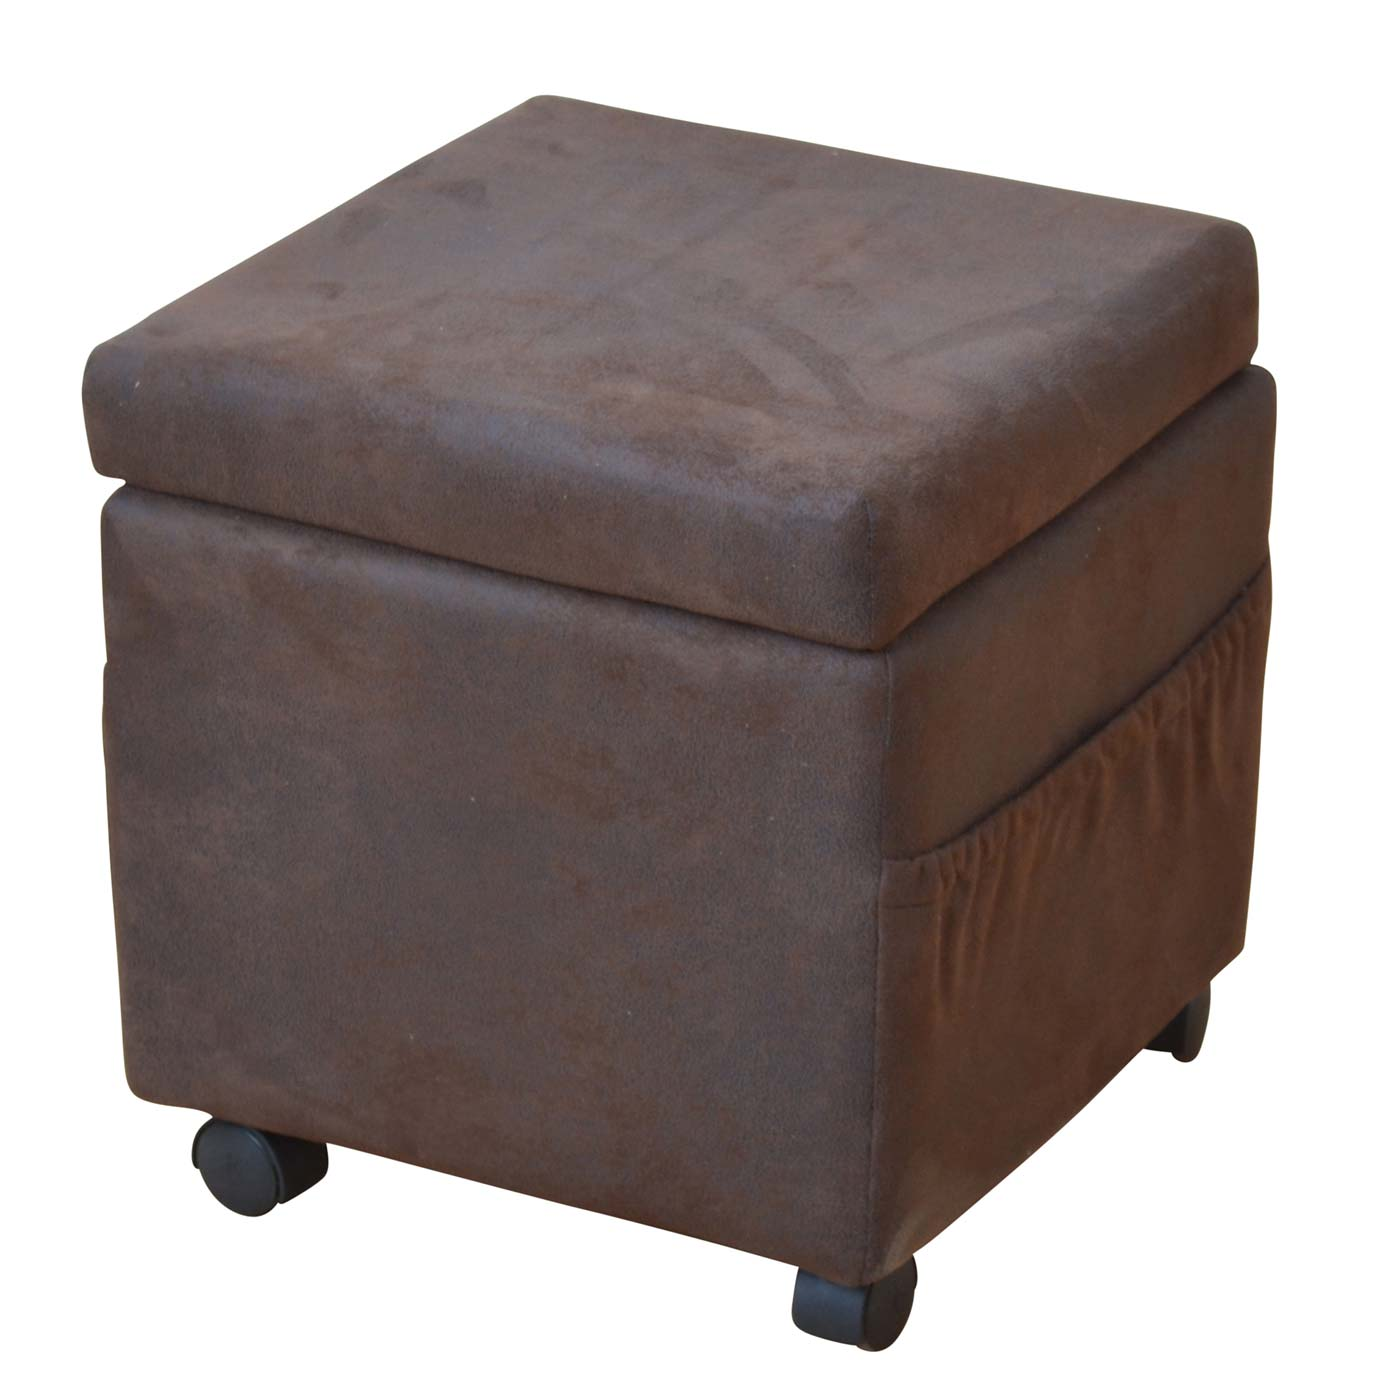 sitzw rfel mit rollen bestseller shop f r m bel und. Black Bedroom Furniture Sets. Home Design Ideas